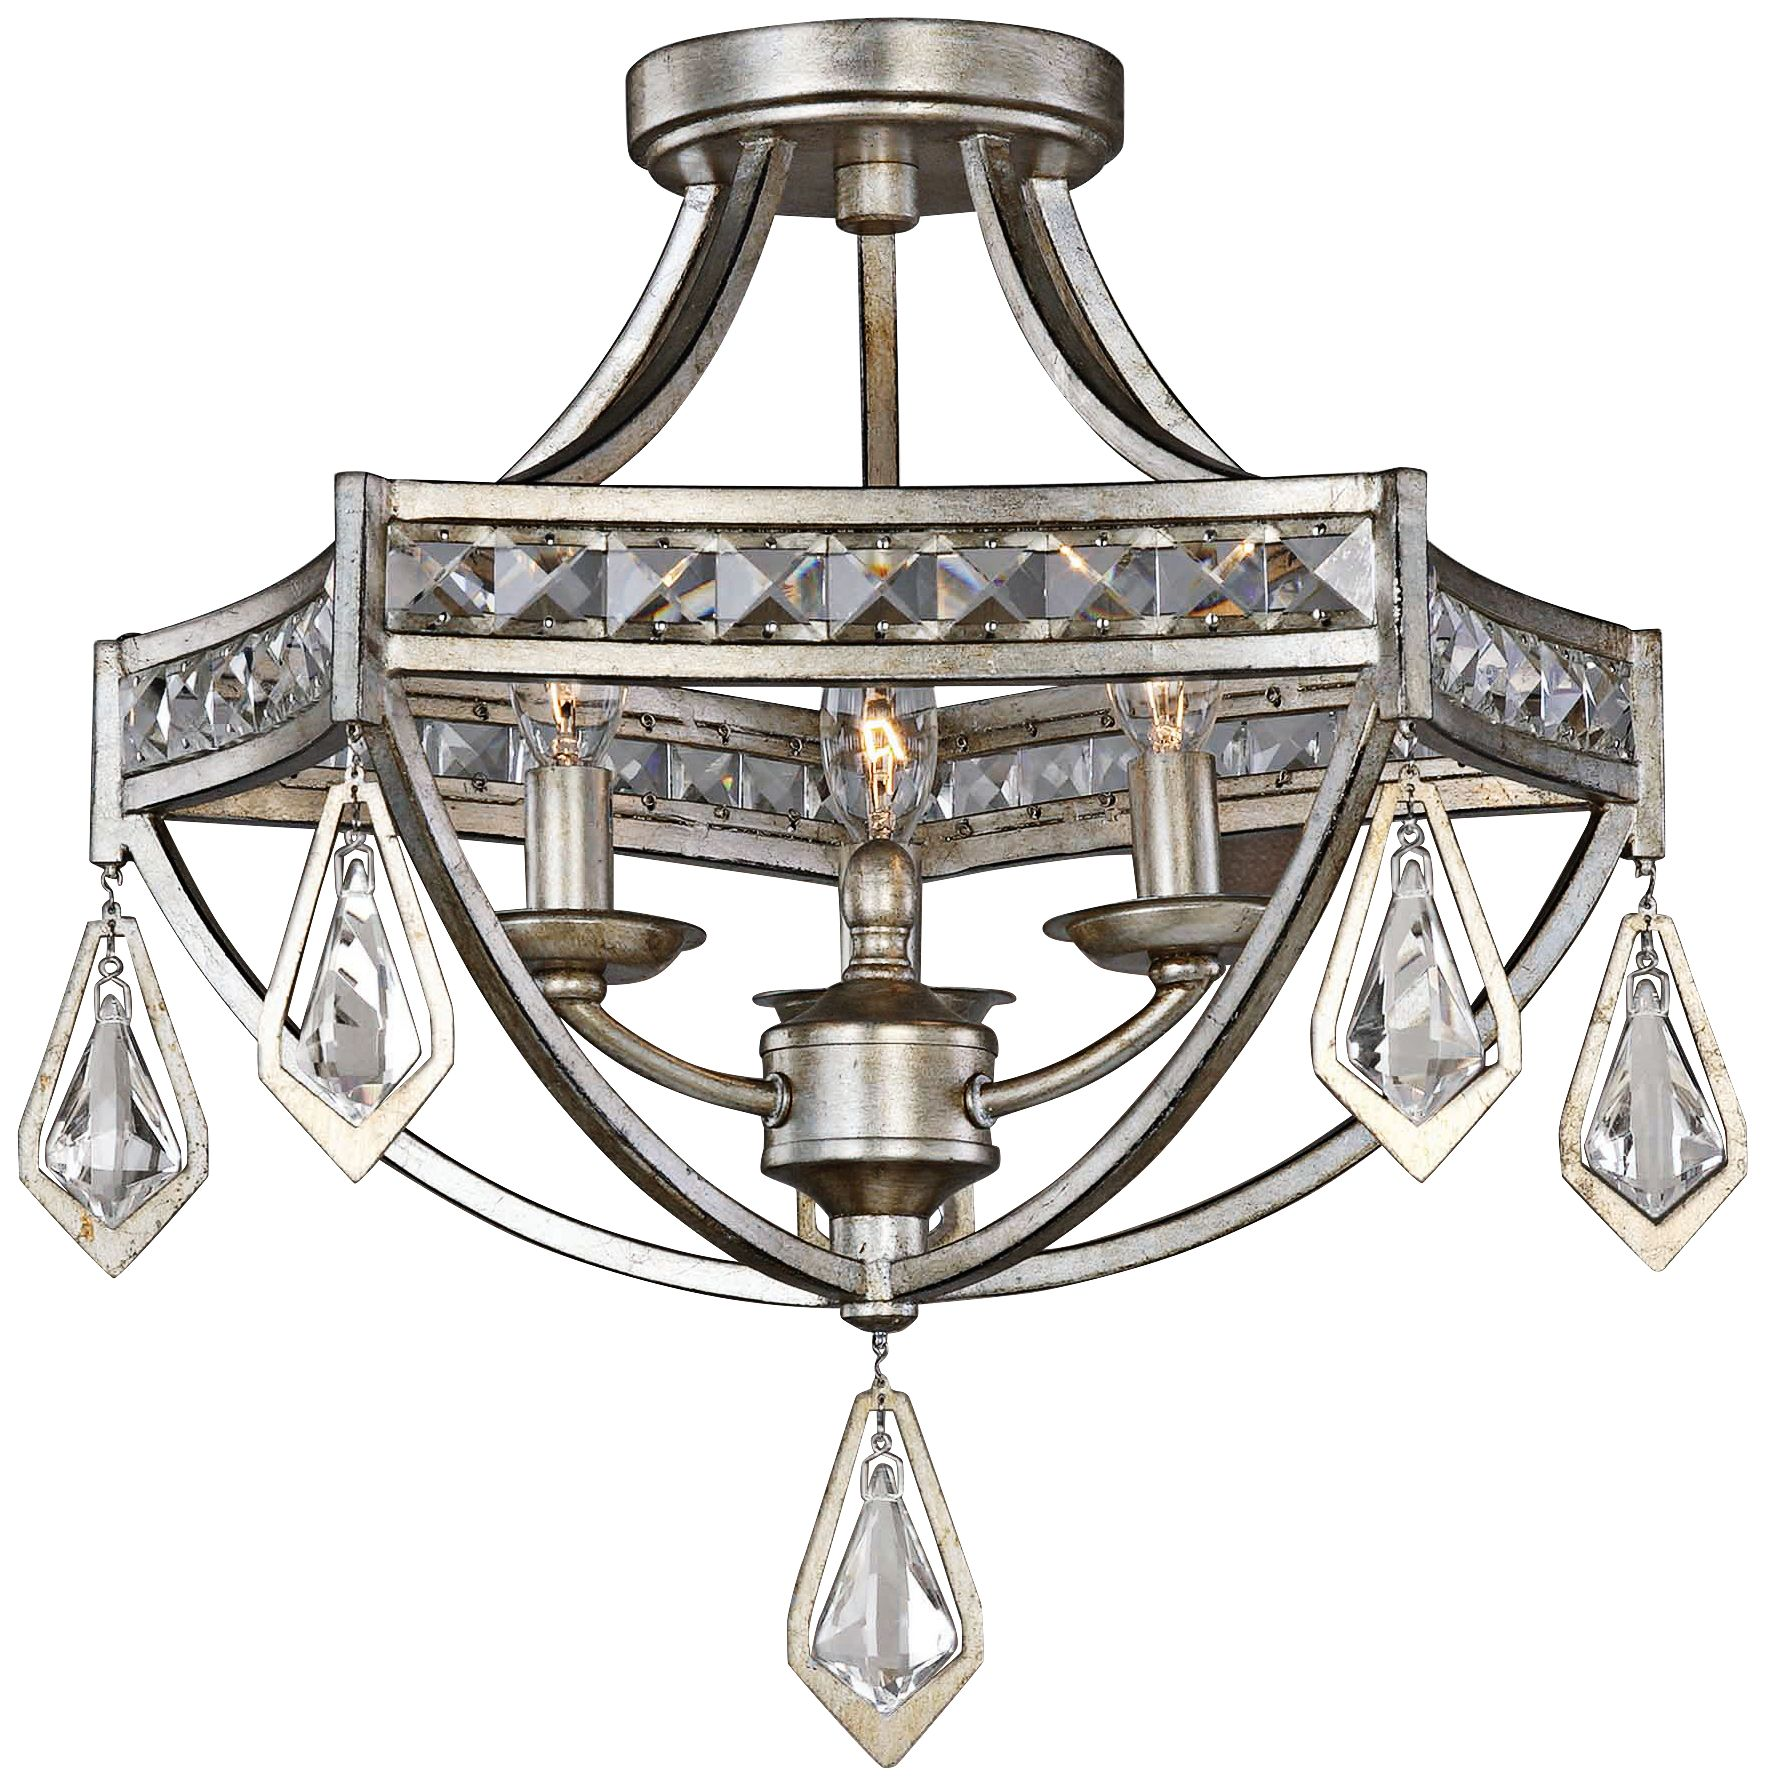 uttermost tamworth 19   wide champagne leaf ceiling light uttermost semi flush mount close to ceiling lights   lamps plus  rh   lampsplus